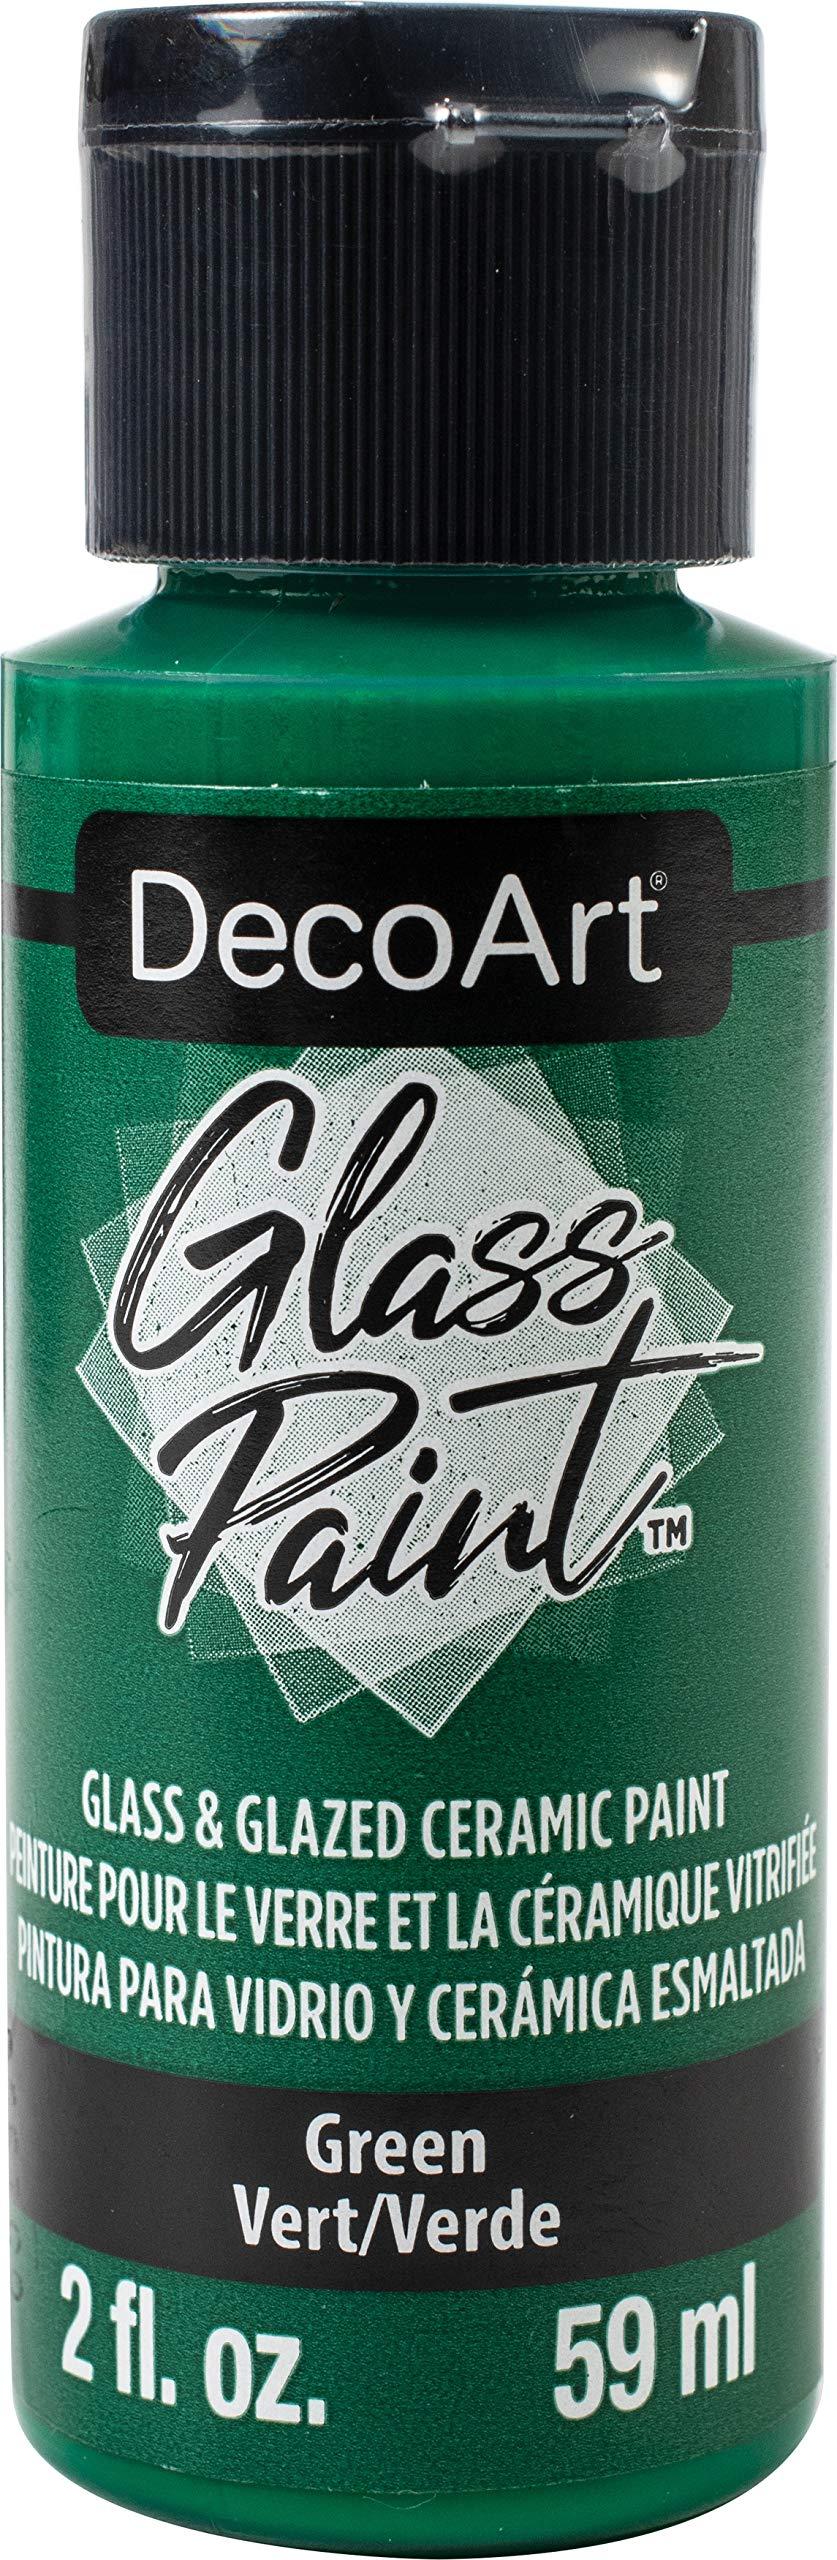 Deco Art GLASS PAINT 2OZ GREEN, us:one size